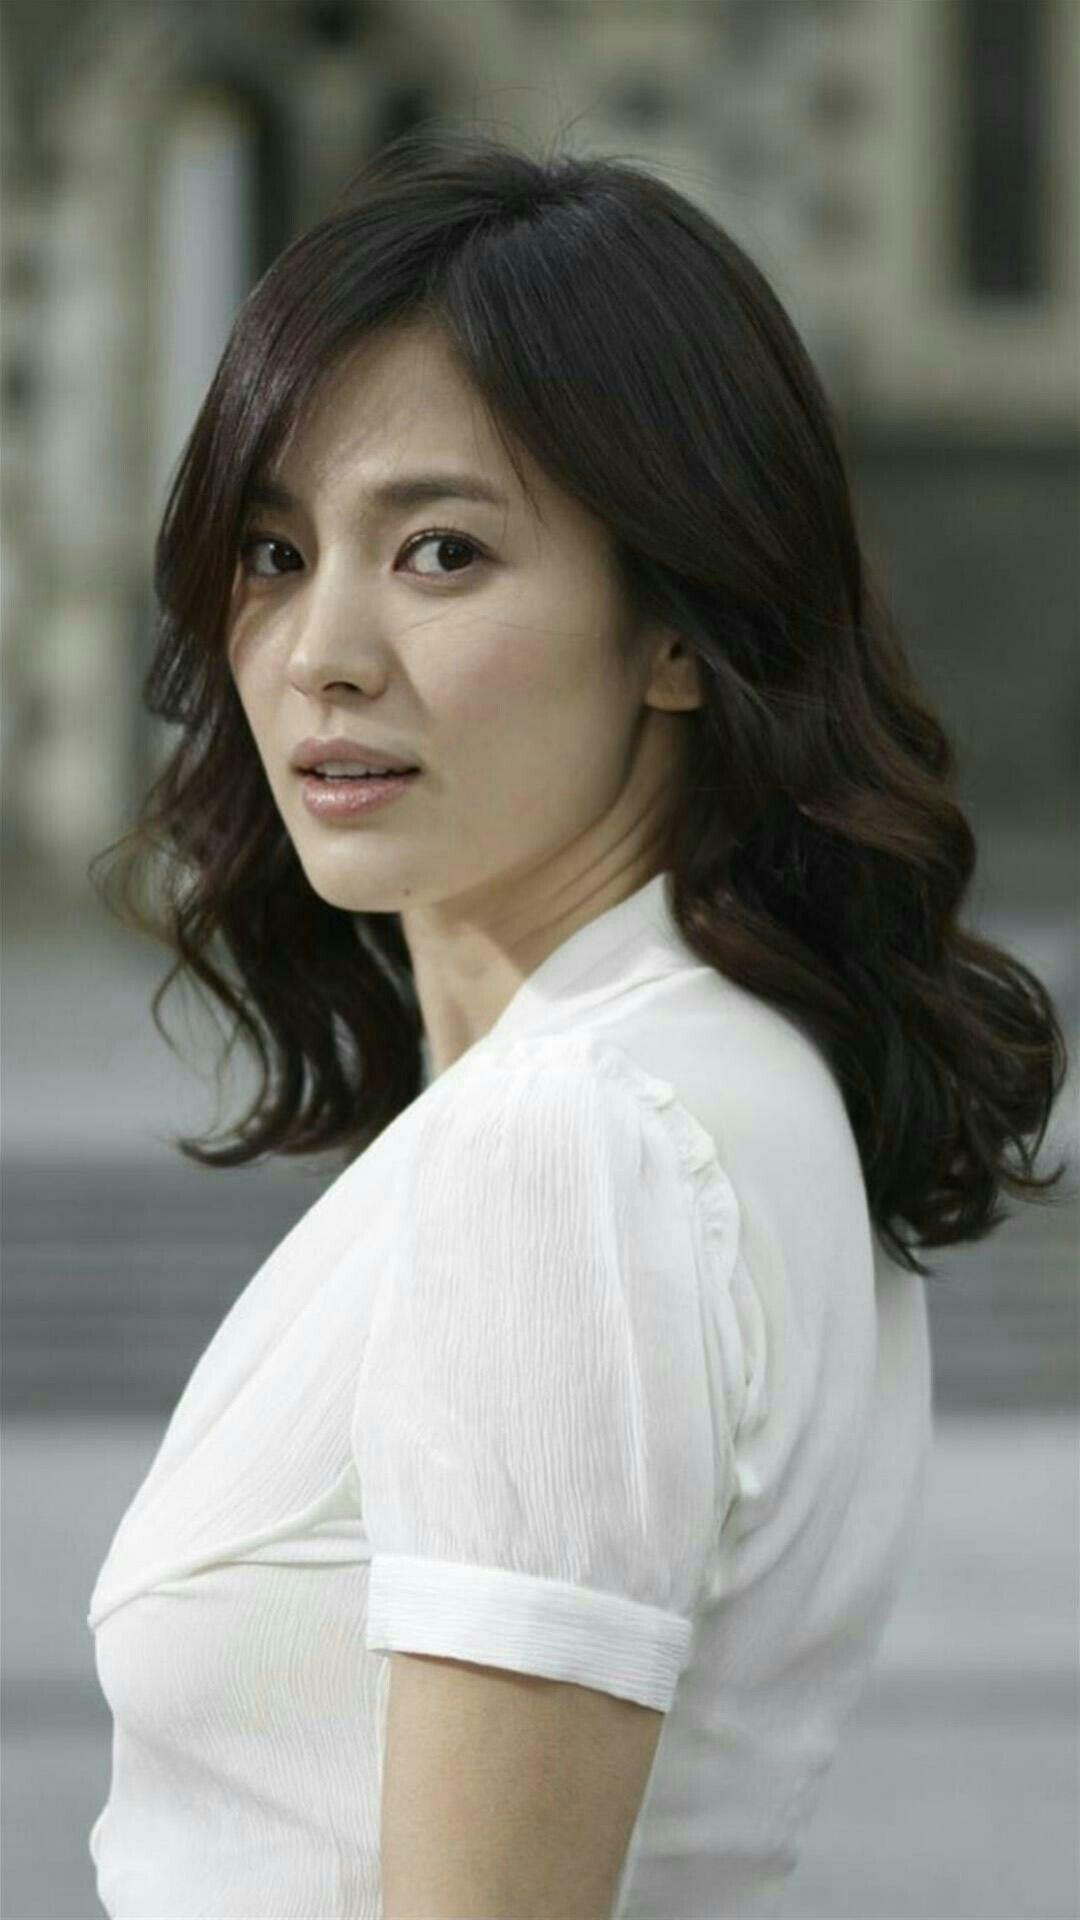 The stunning Song Hye-kyo | Song hye kyo, Korean beauty ...